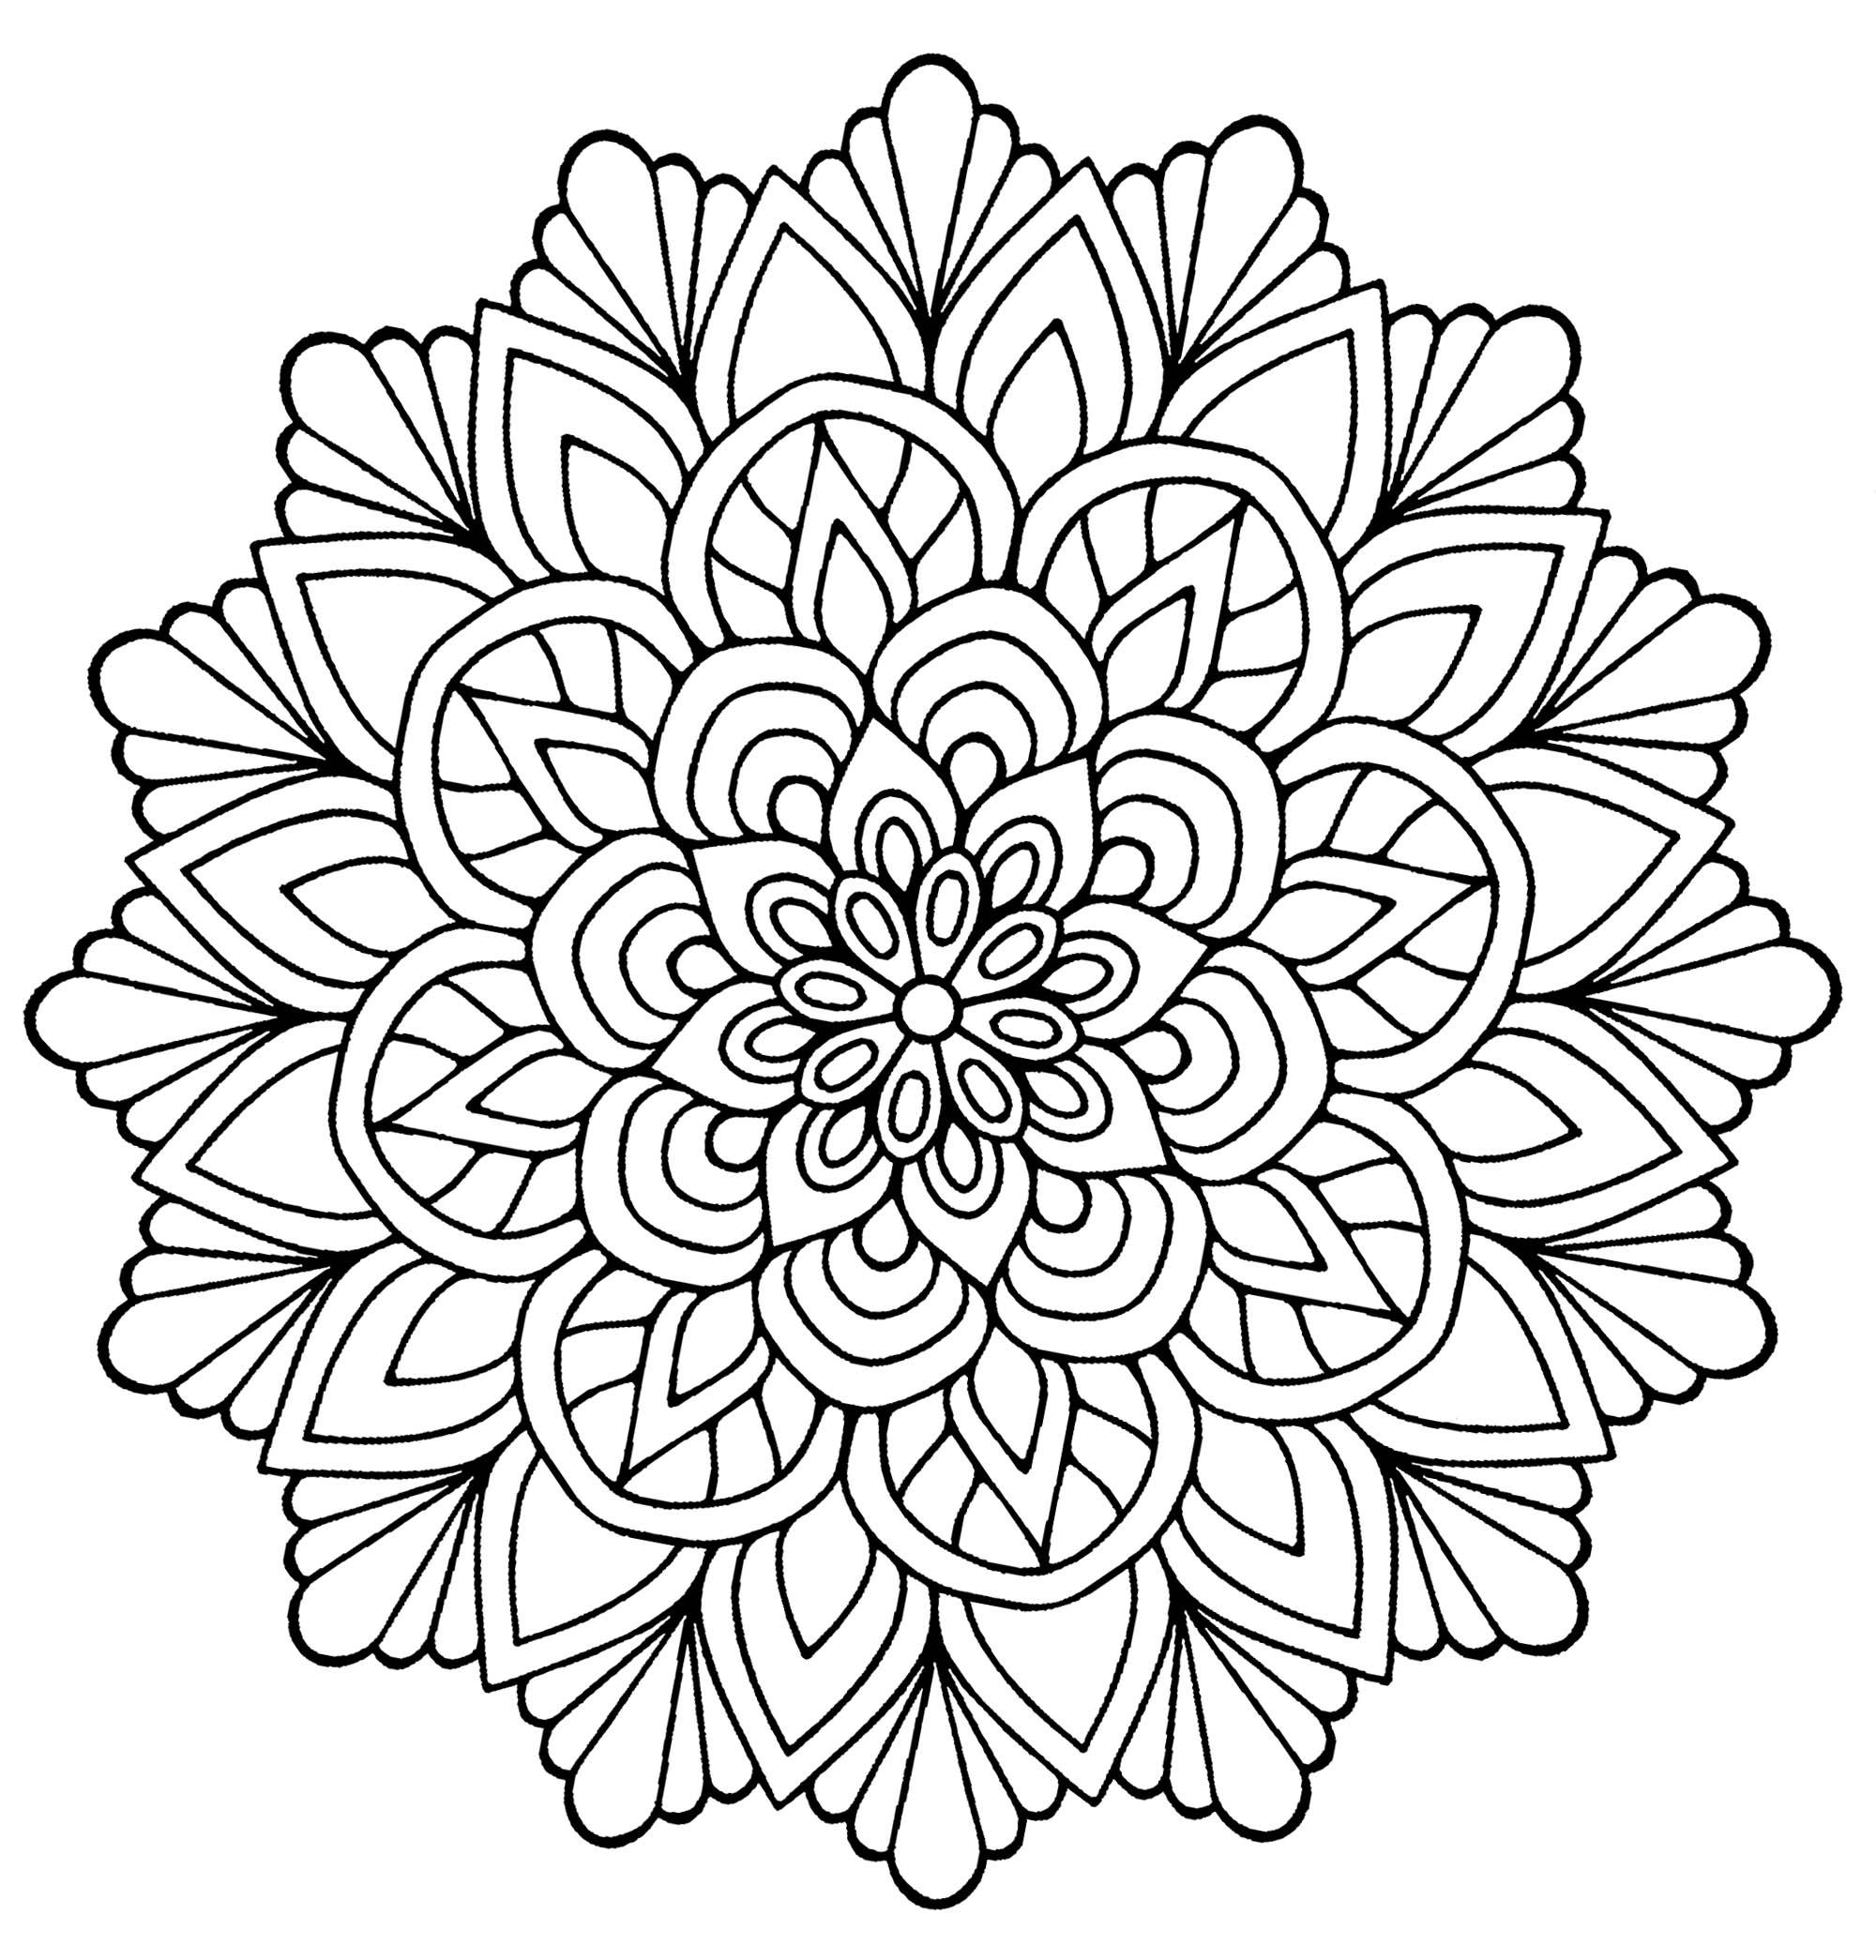 Coloriage Mandala Difficile Fleur.Mandala Fleur Avec Feuilles Mandalas Coloriages Difficiles Pour